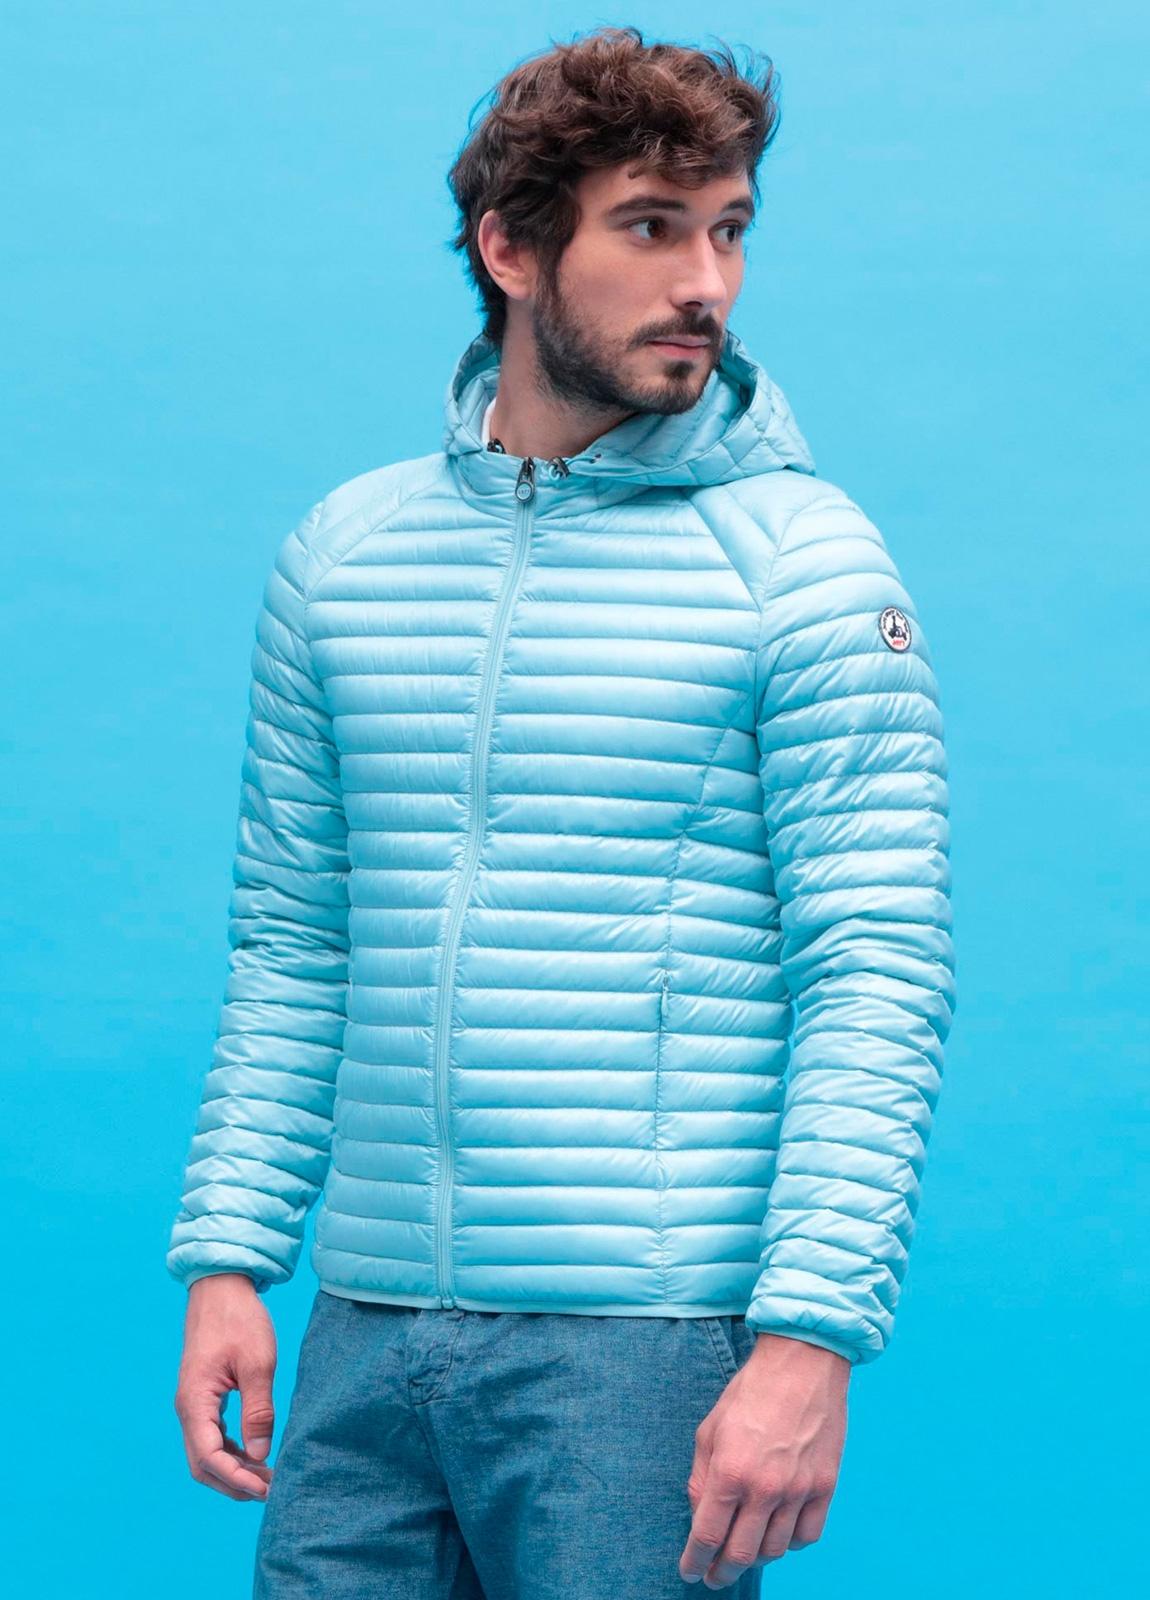 Chaqueta ligera hombre con capucha modelo LEON color azul con bolsa para transporte incluida.